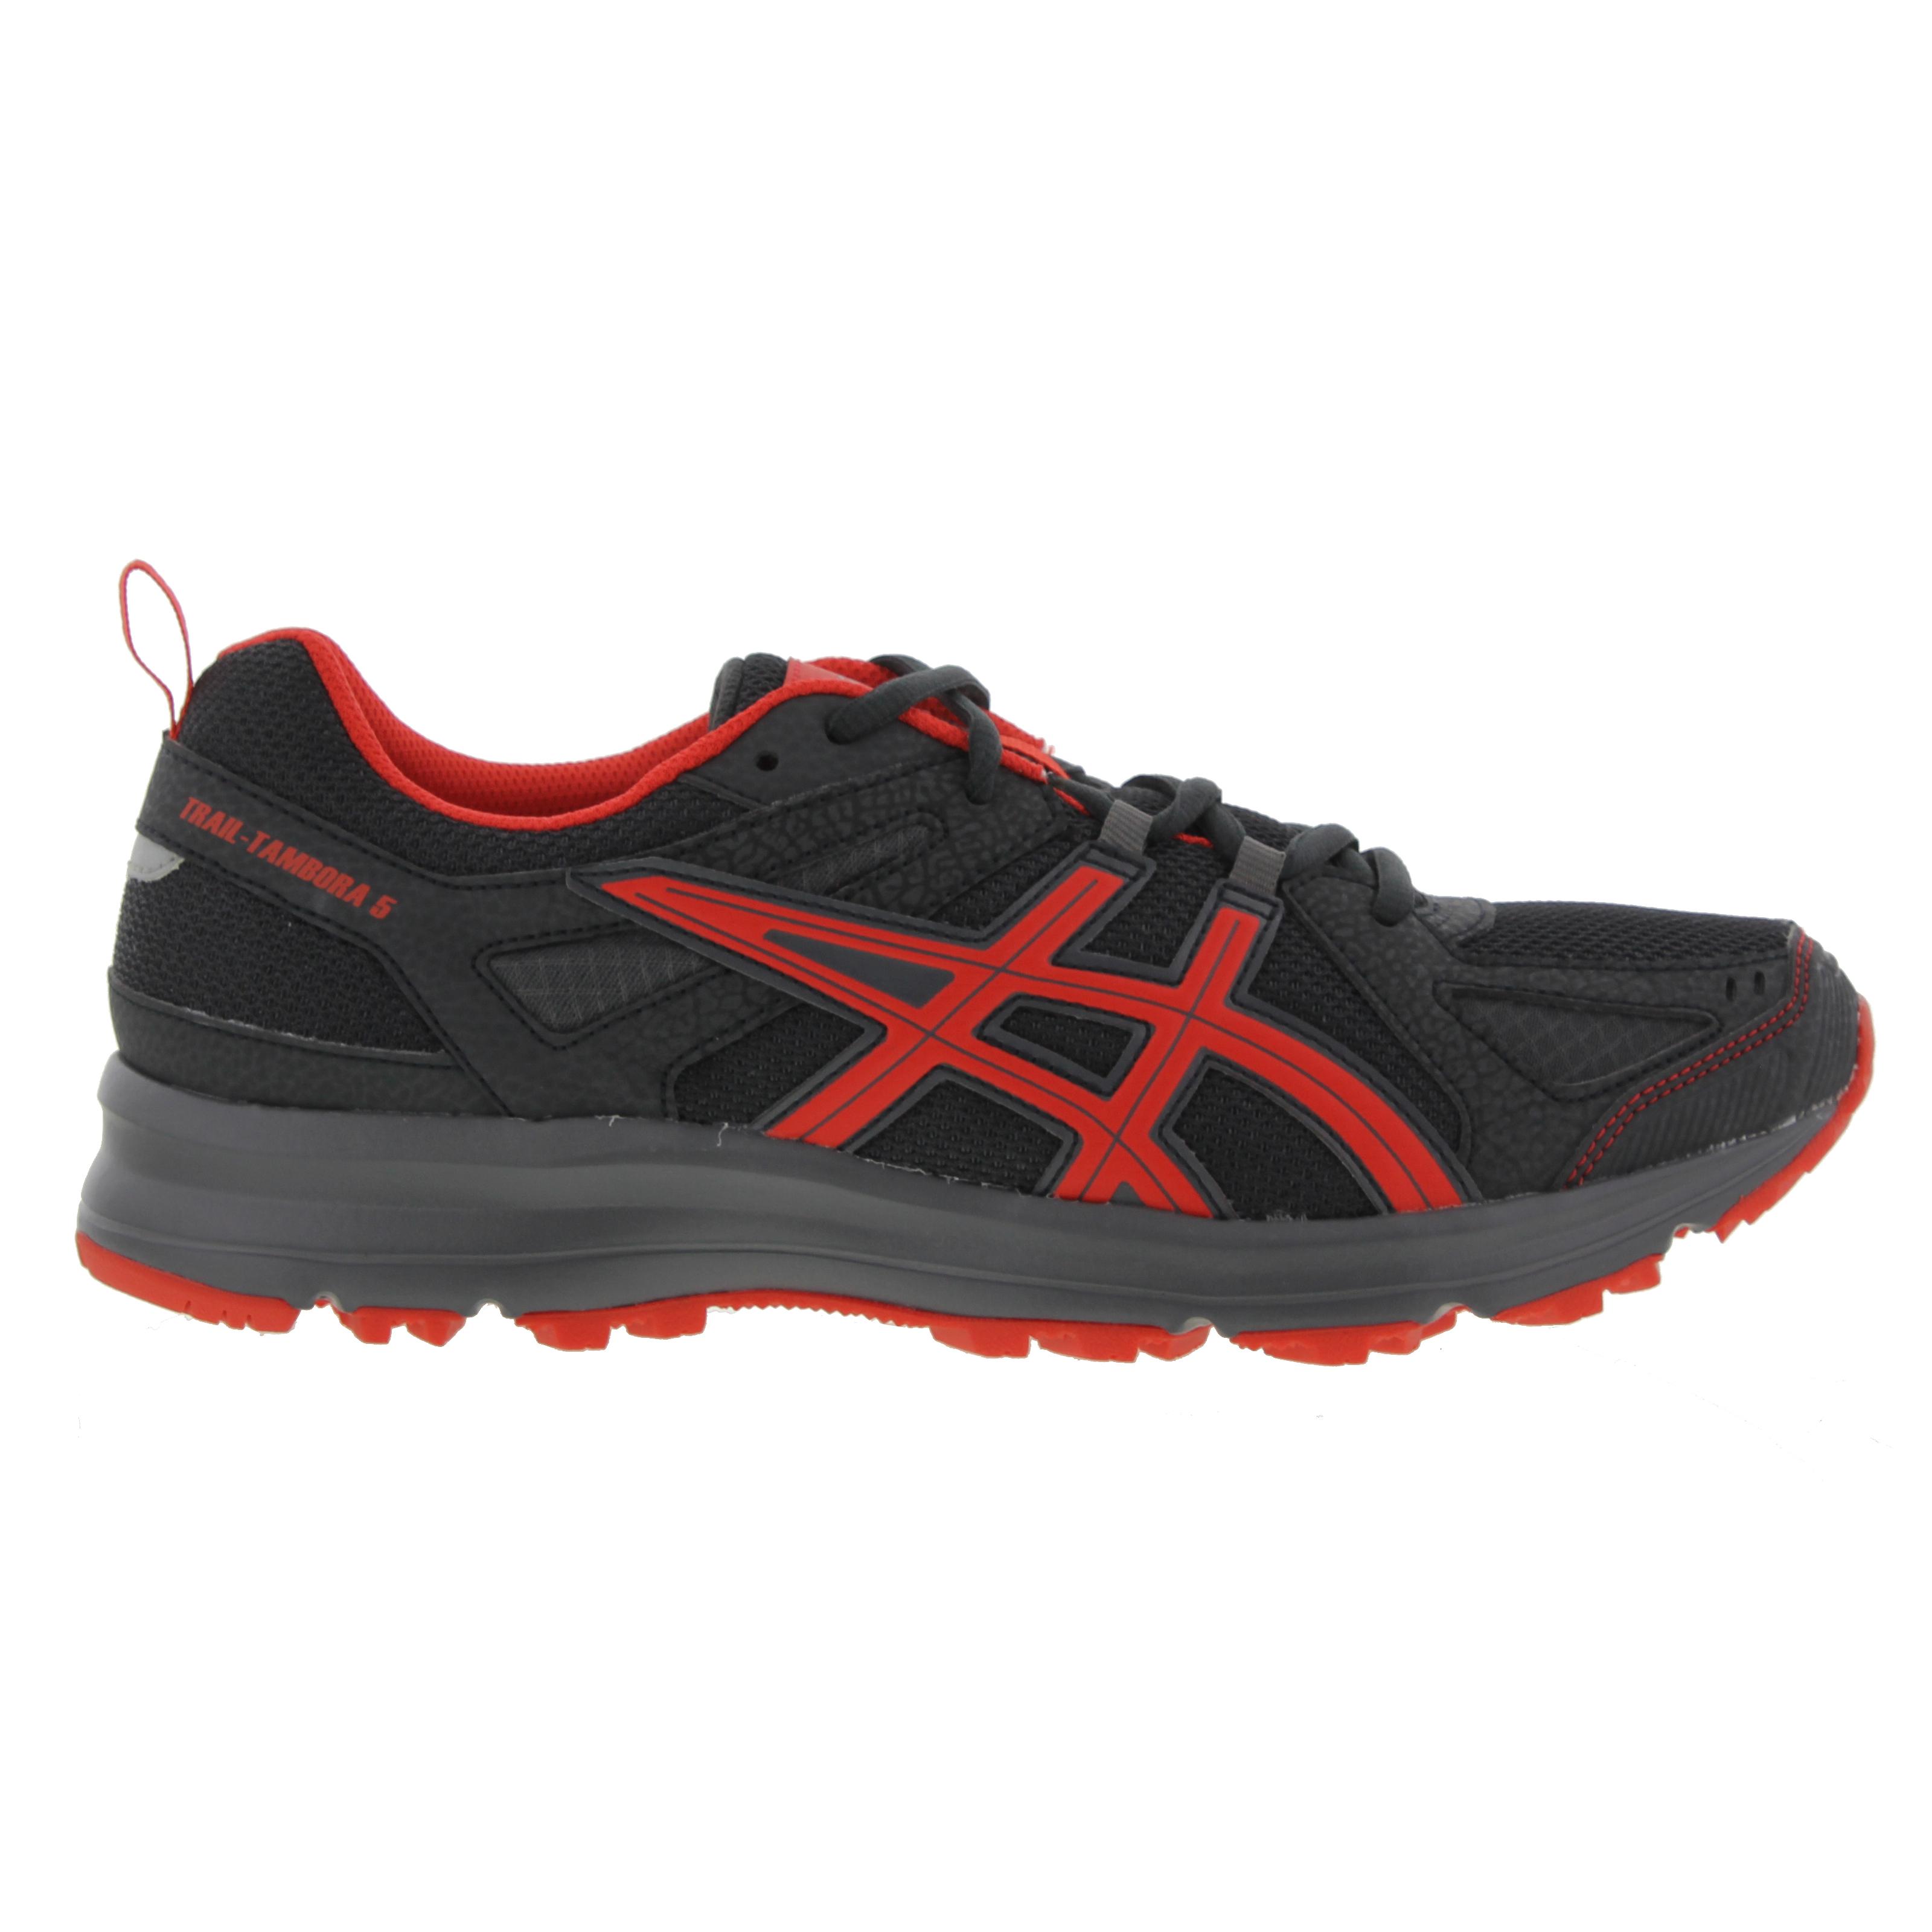 Addids Running Shoes Ebay Kid